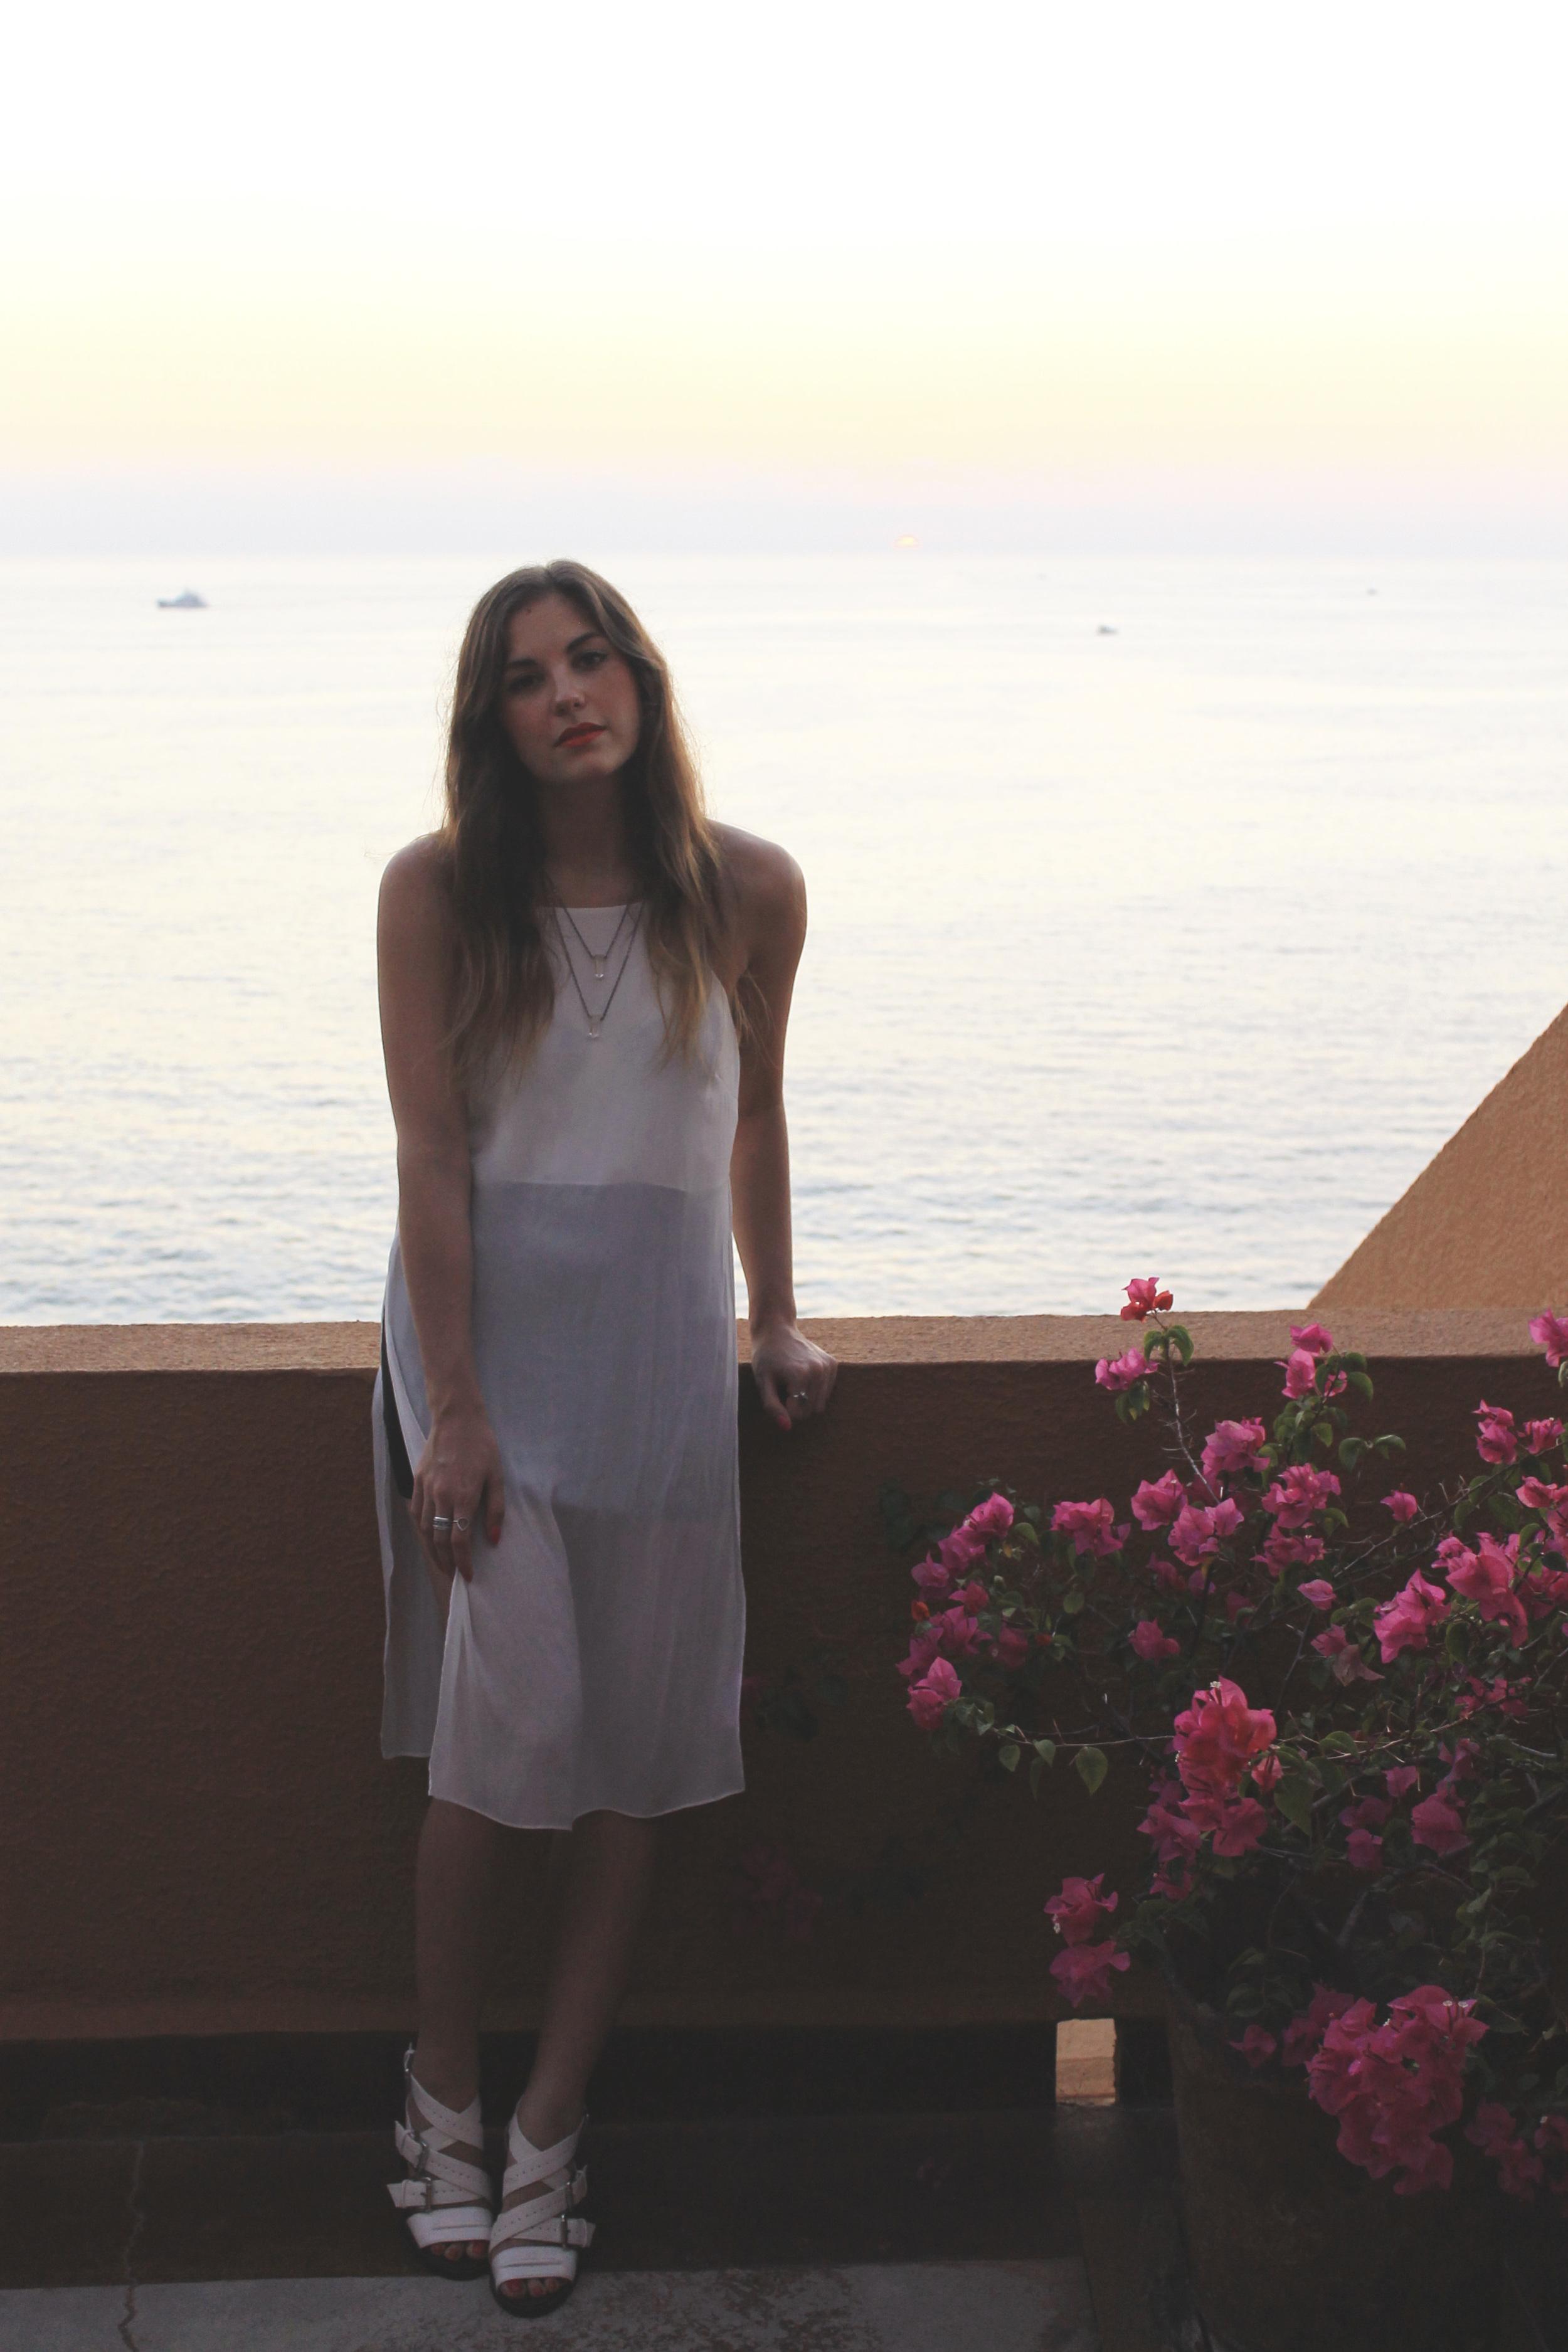 zara white midi slit tank white block buckled strappy heels h&m outfit style